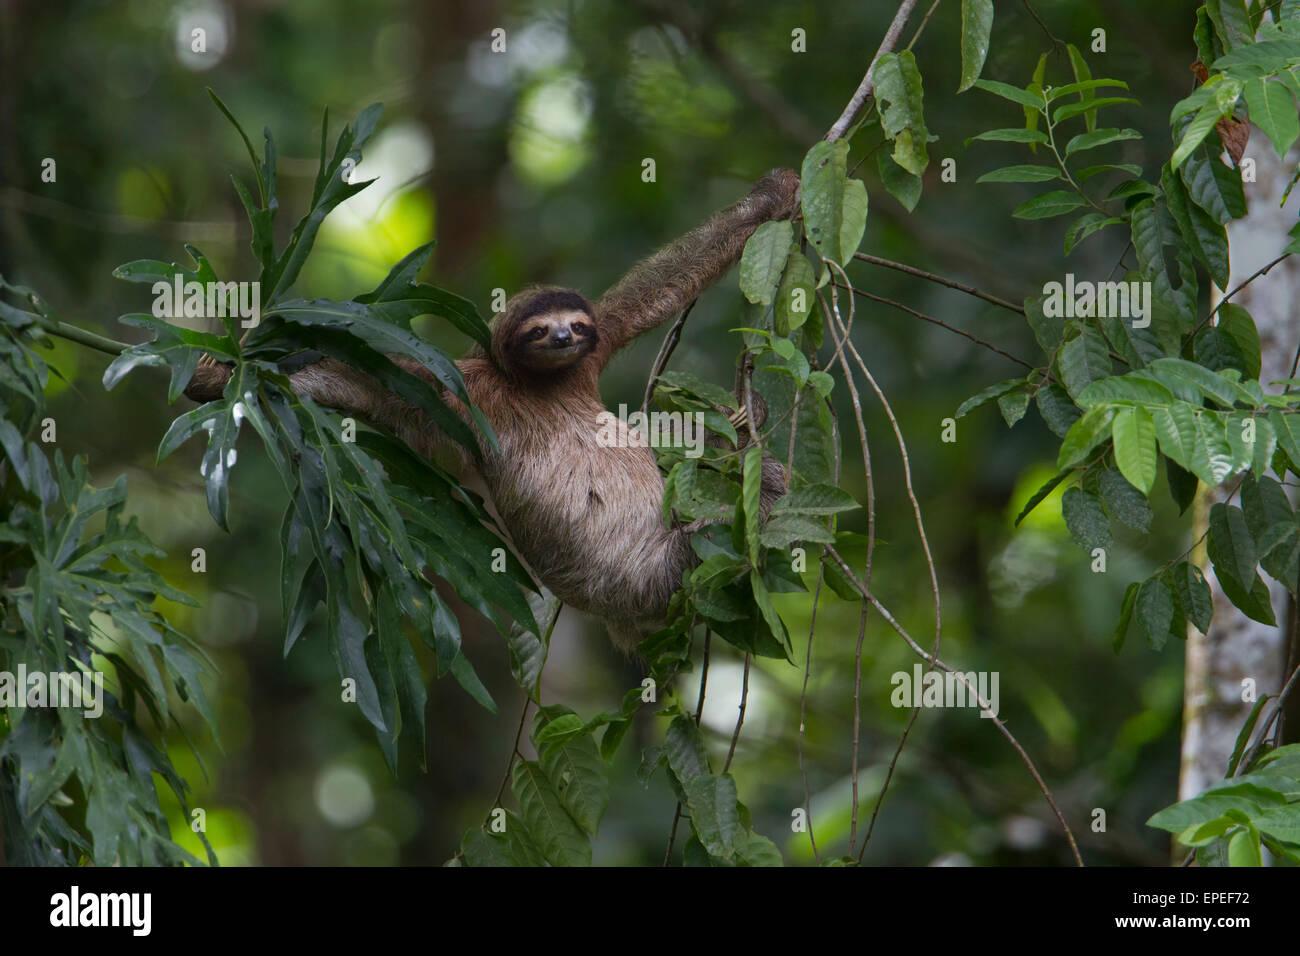 Brown-throated sloth (Bradypus variegatus) hanging between lianas in the tropical rainforest, Puerto Viejo de Talamanca - Stock Image